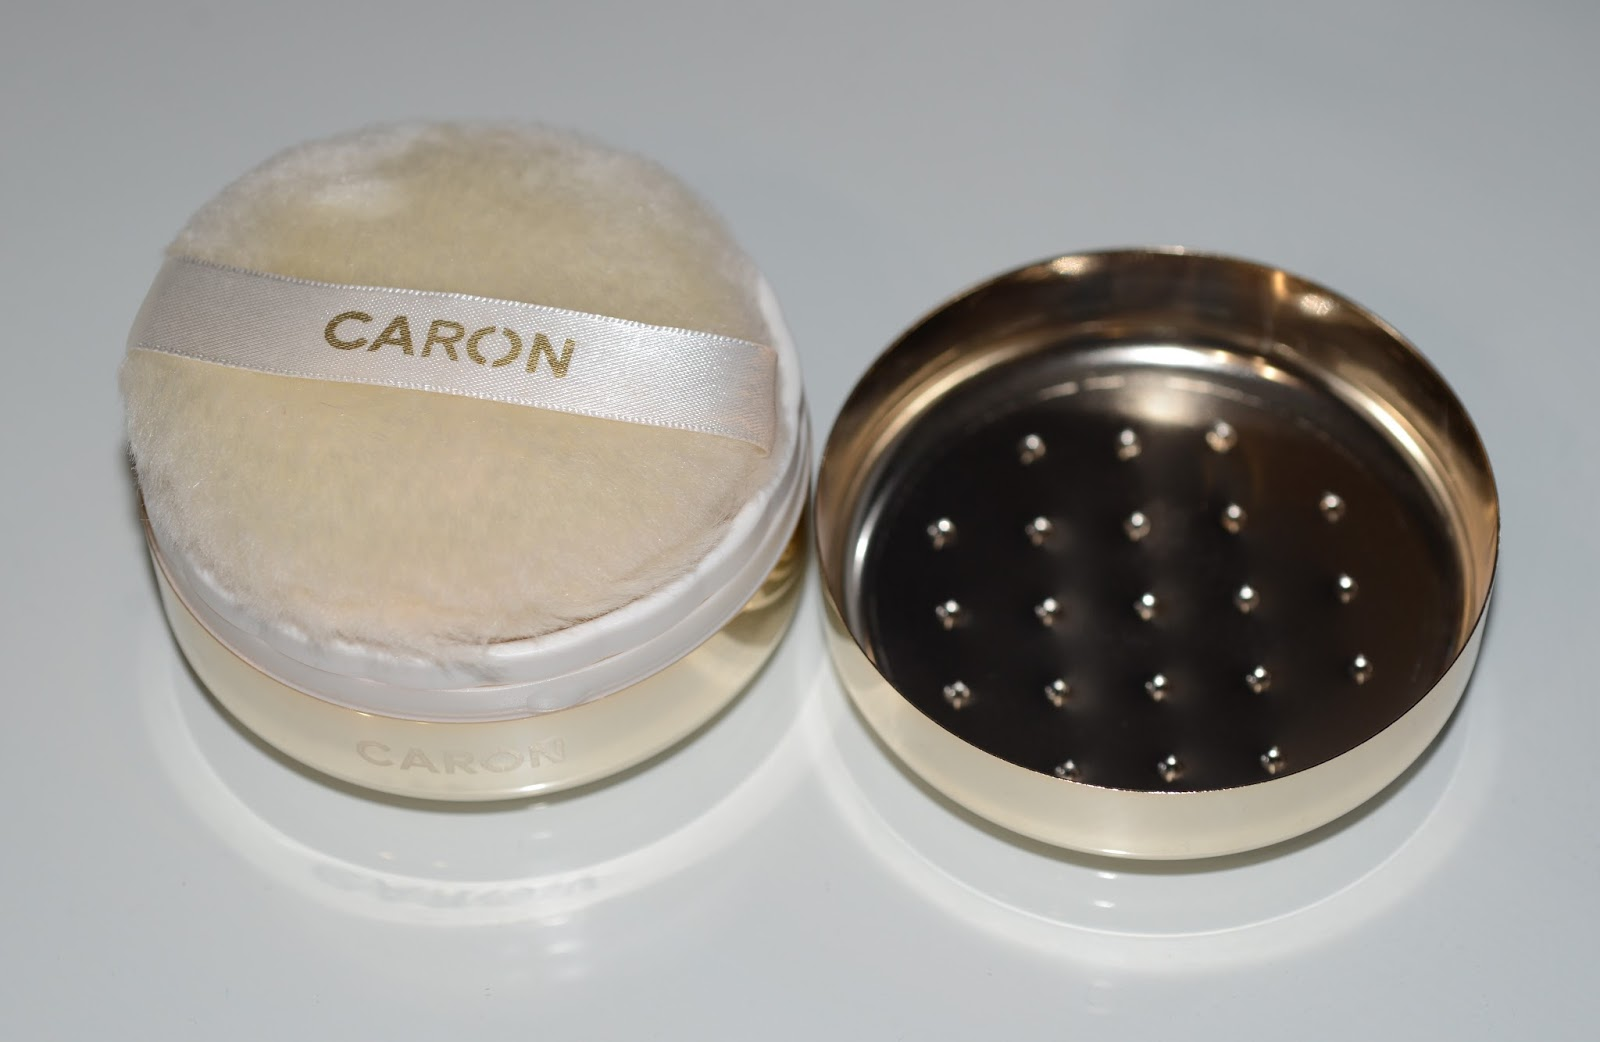 Caron пудра рассыпчатая, оттенок lumiere dambre caron.